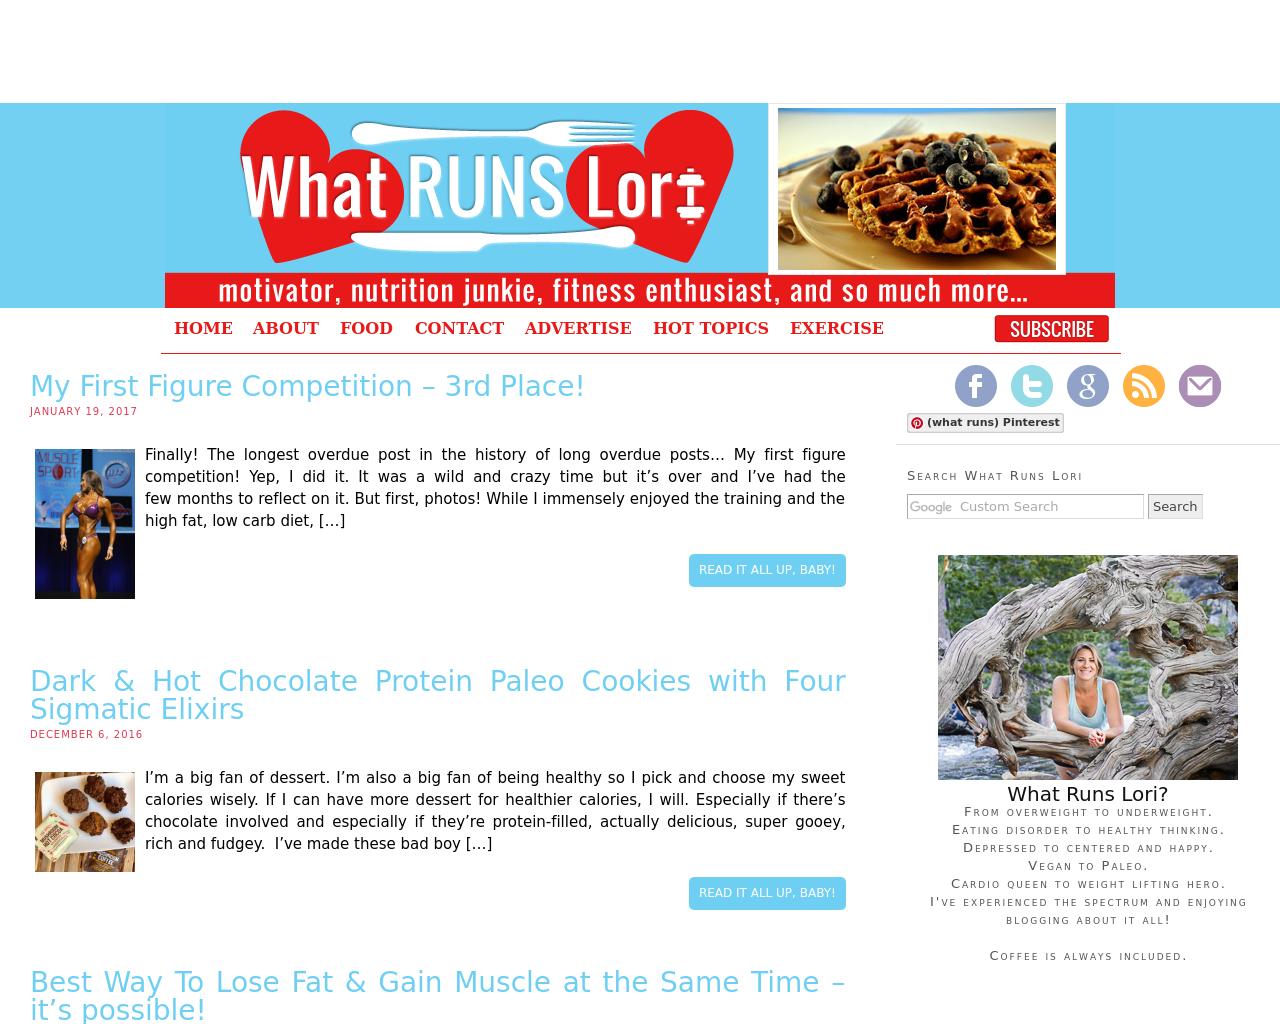 What-Runs-Lori-Advertising-Reviews-Pricing